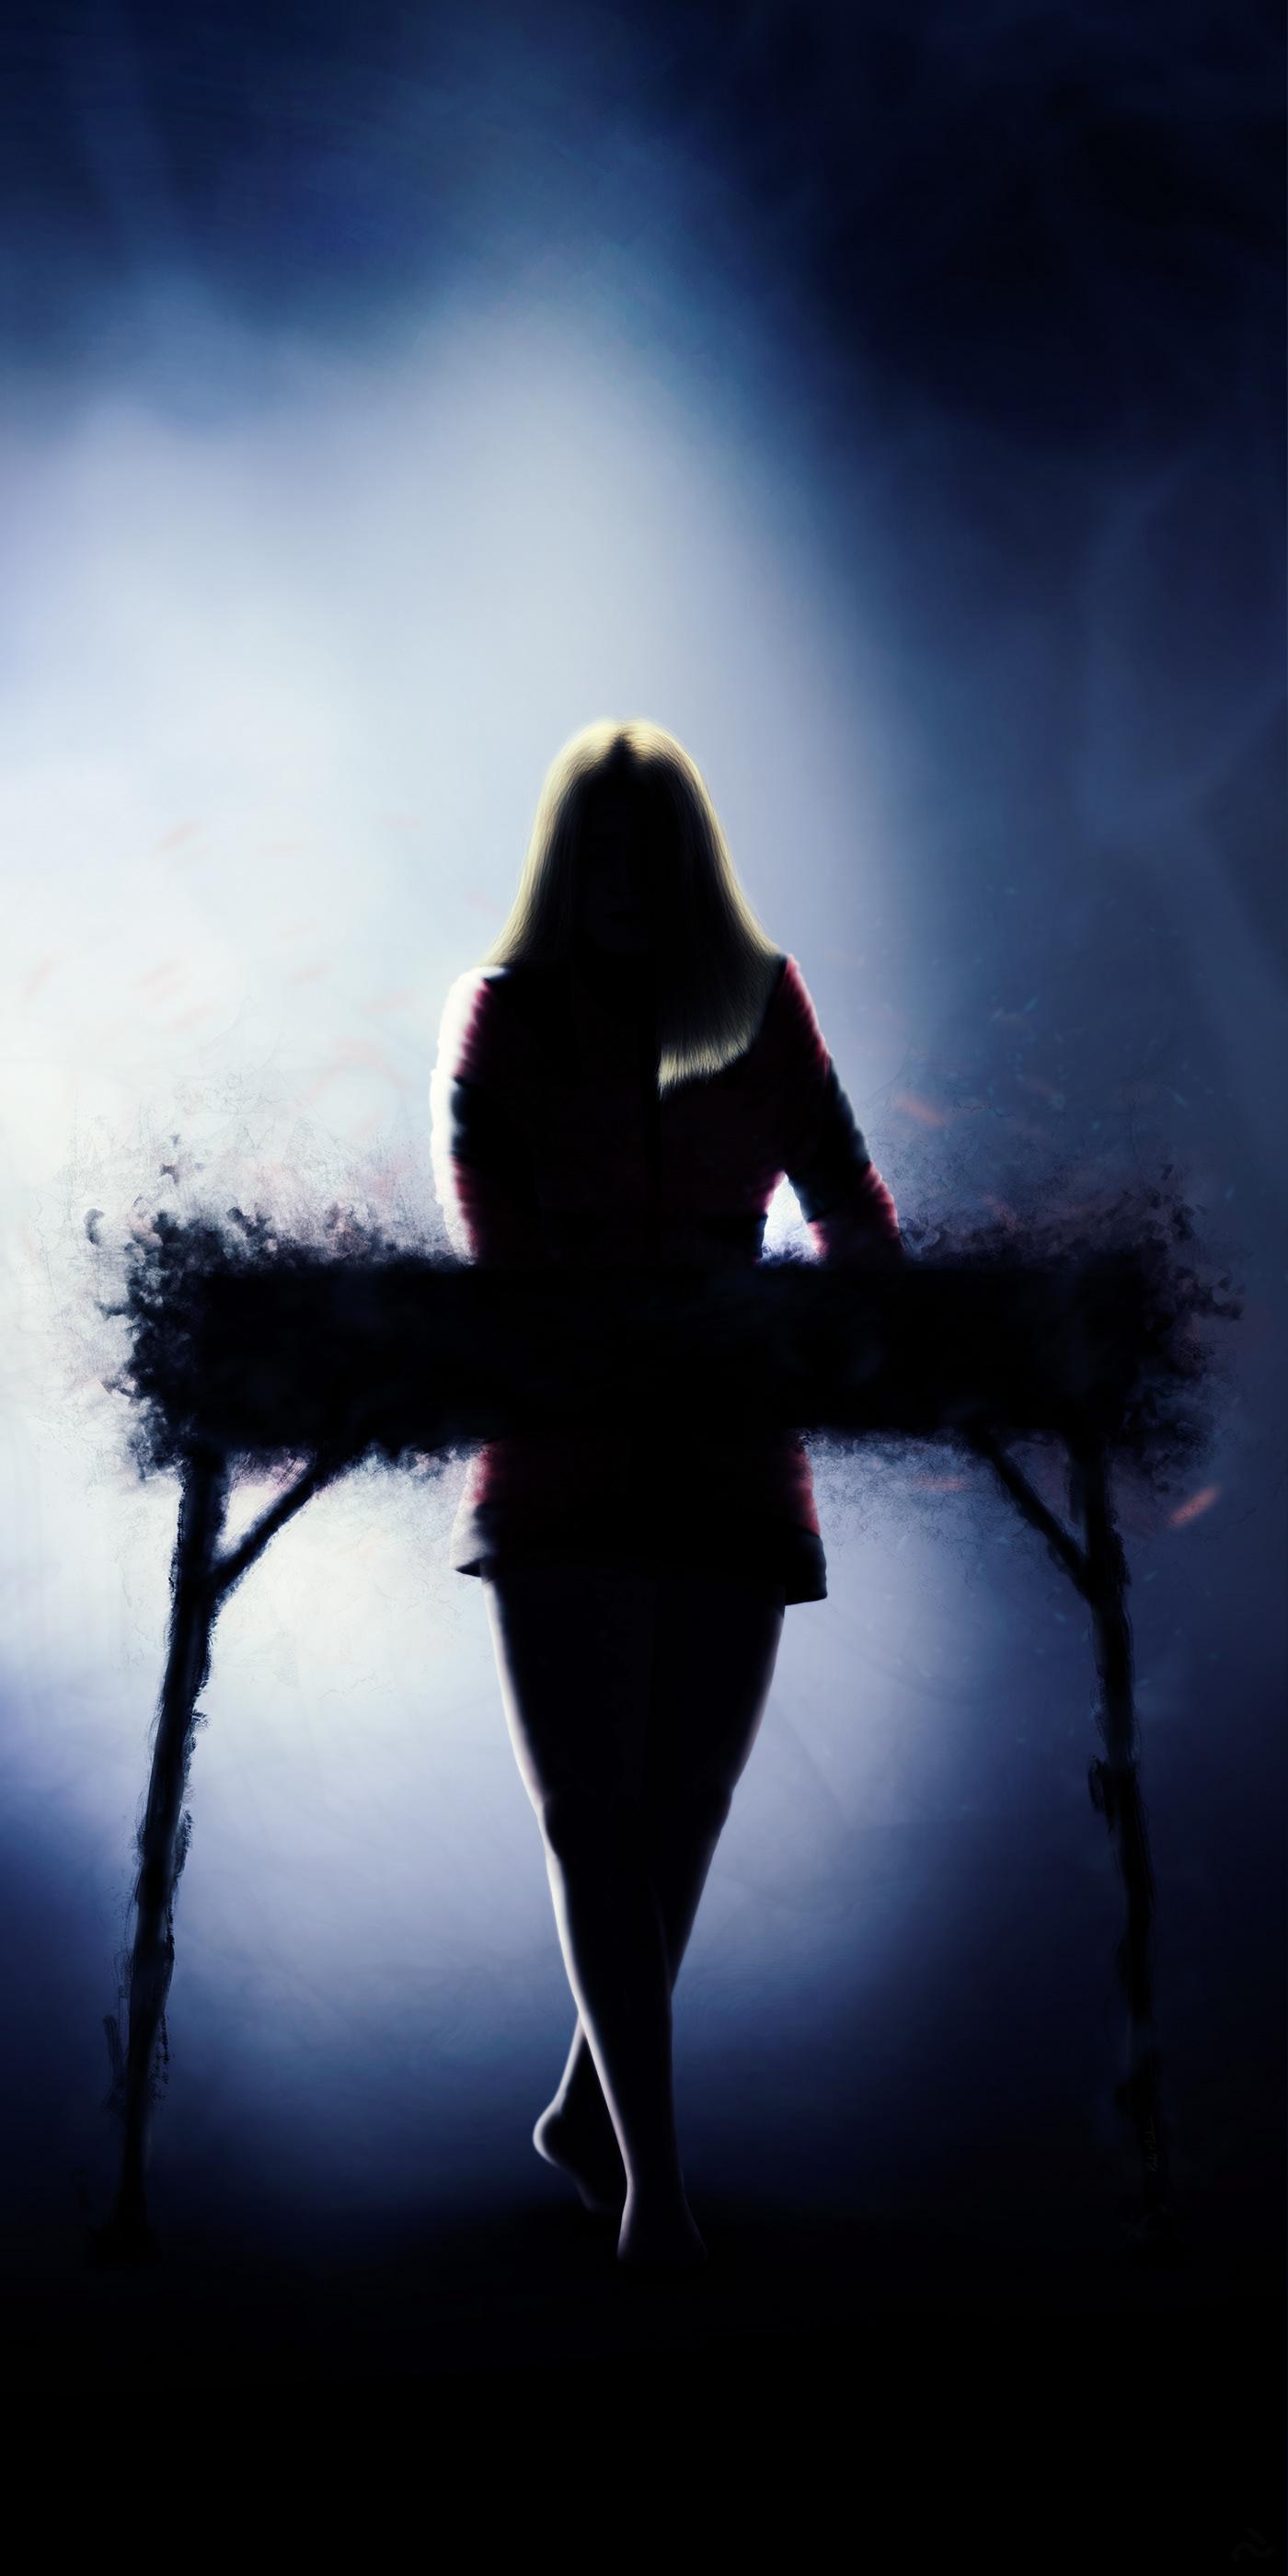 Digital Art  digital painting ILLUSTRATION  doom drone music mystery gothic eerie dark